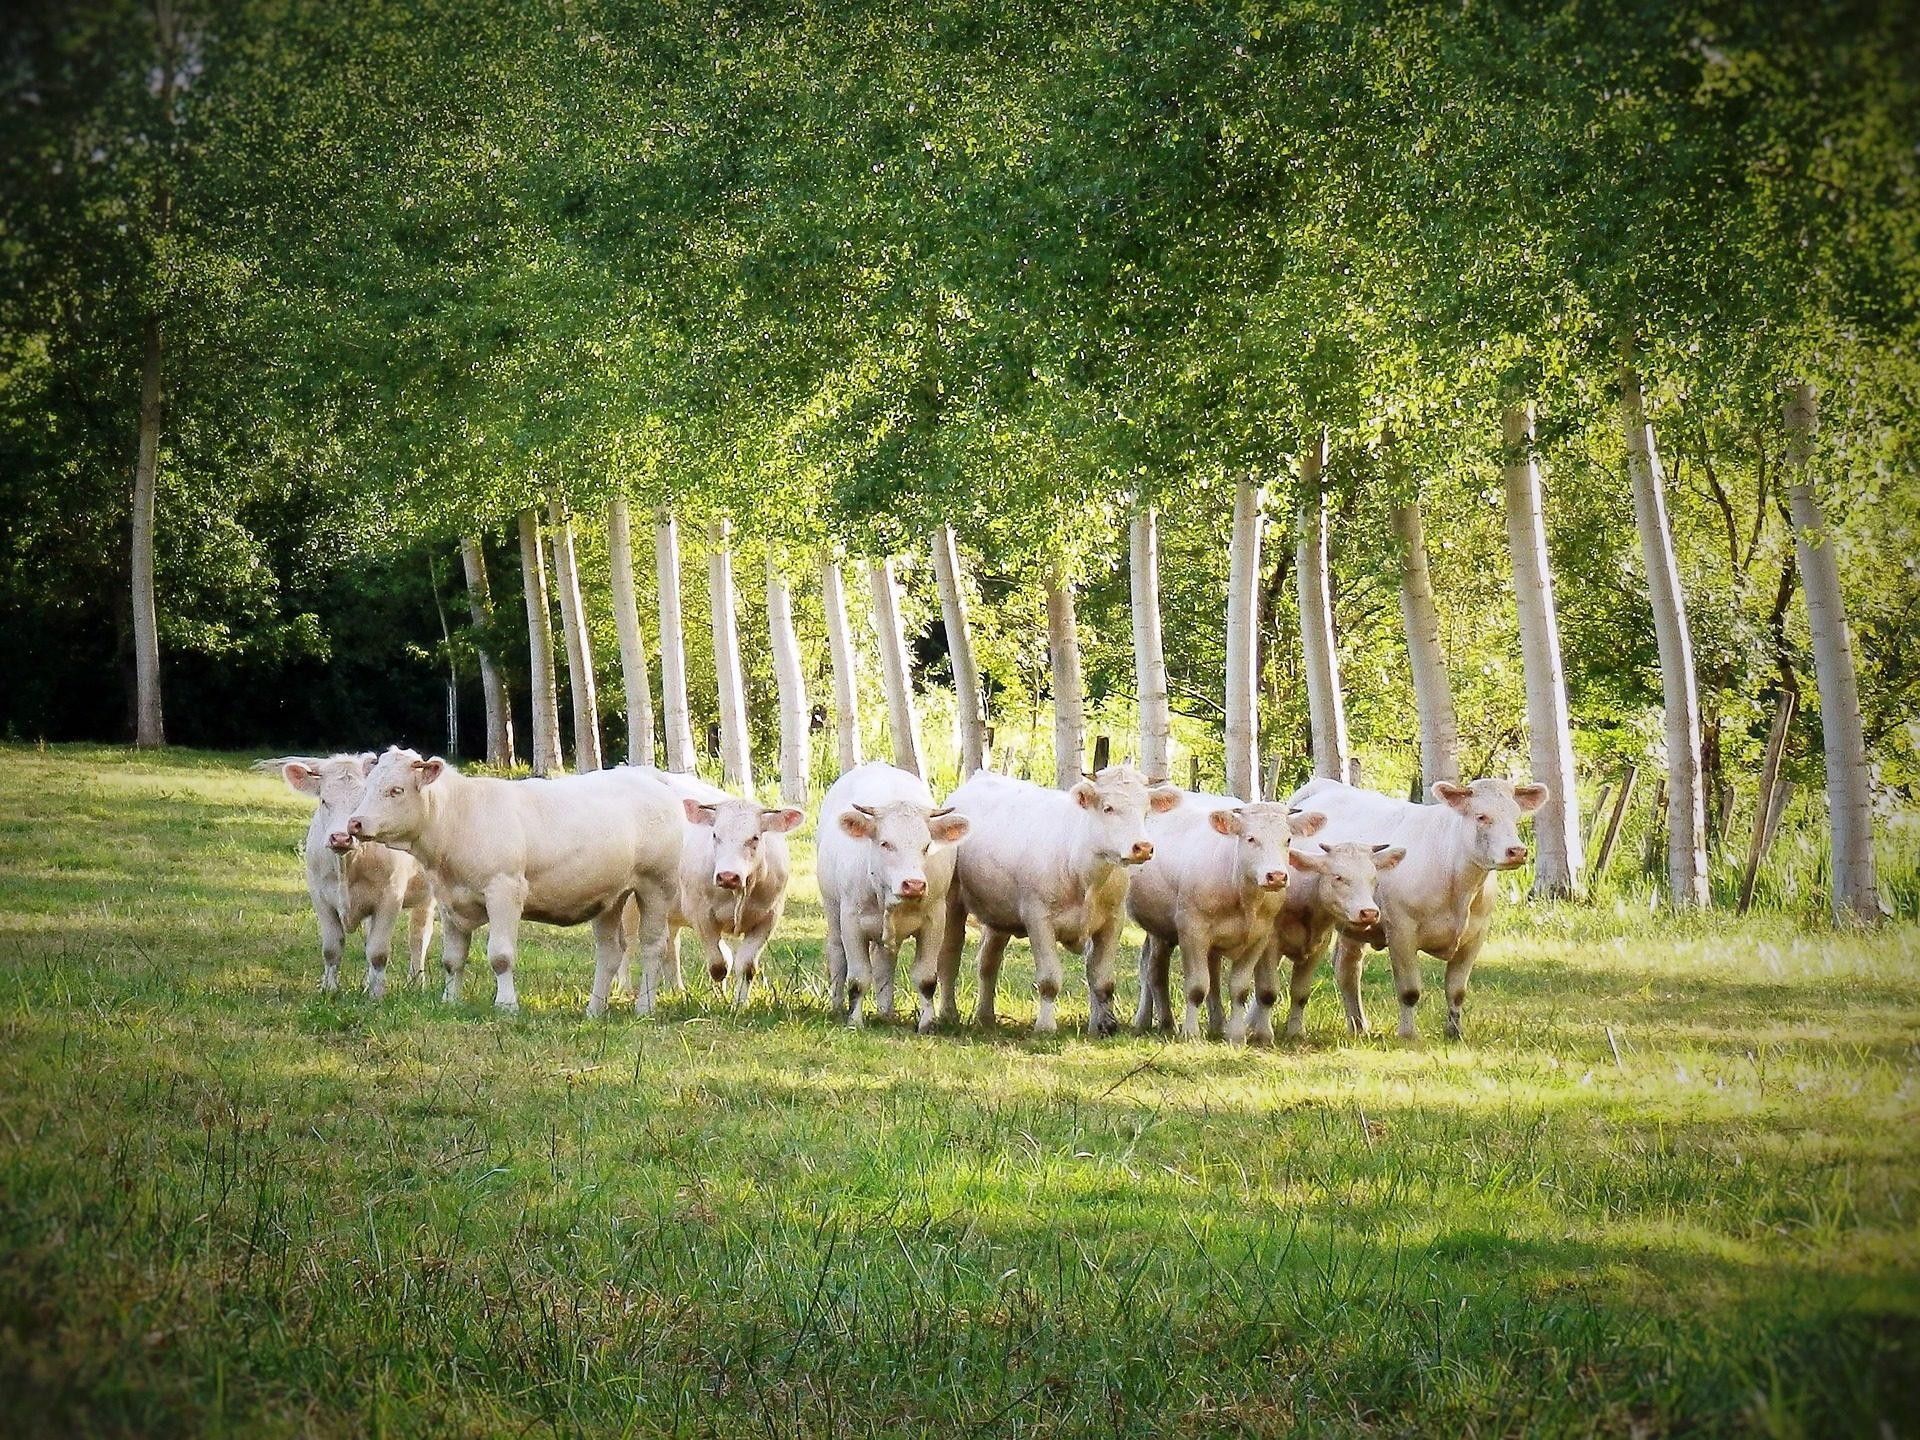 Kühe, Weiden, Bauernhof, Feld, Vieh - Wallpaper HD - Prof.-falken.com